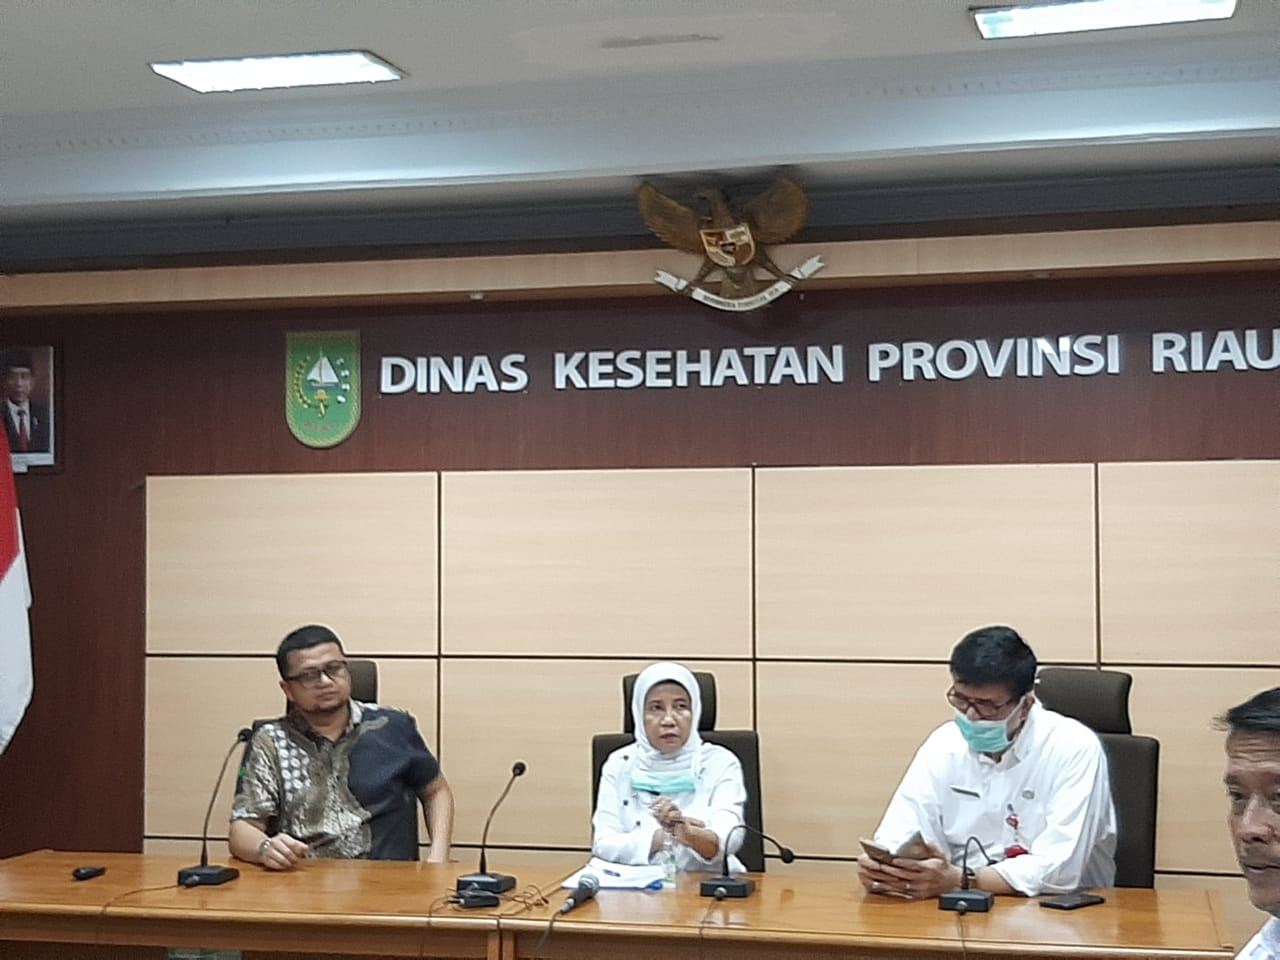 Pasien Pertama Positif Covid-19 di Riau Dirawat di RSUD Arifin Achmad